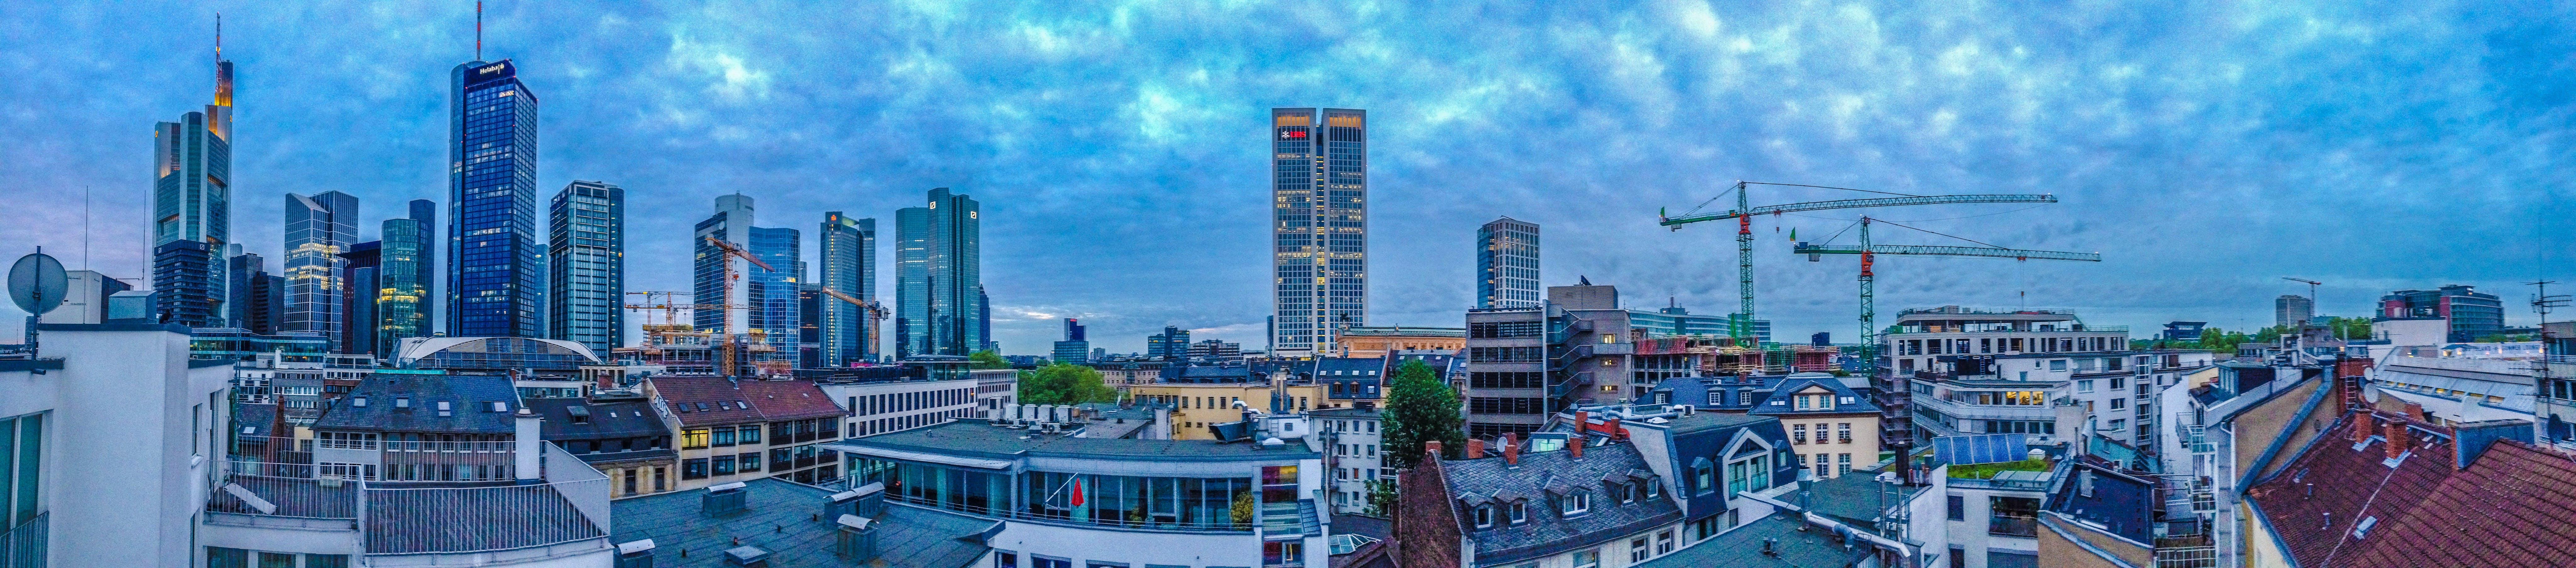 Free stock photo of crane, panorama, panorama view, rooftops